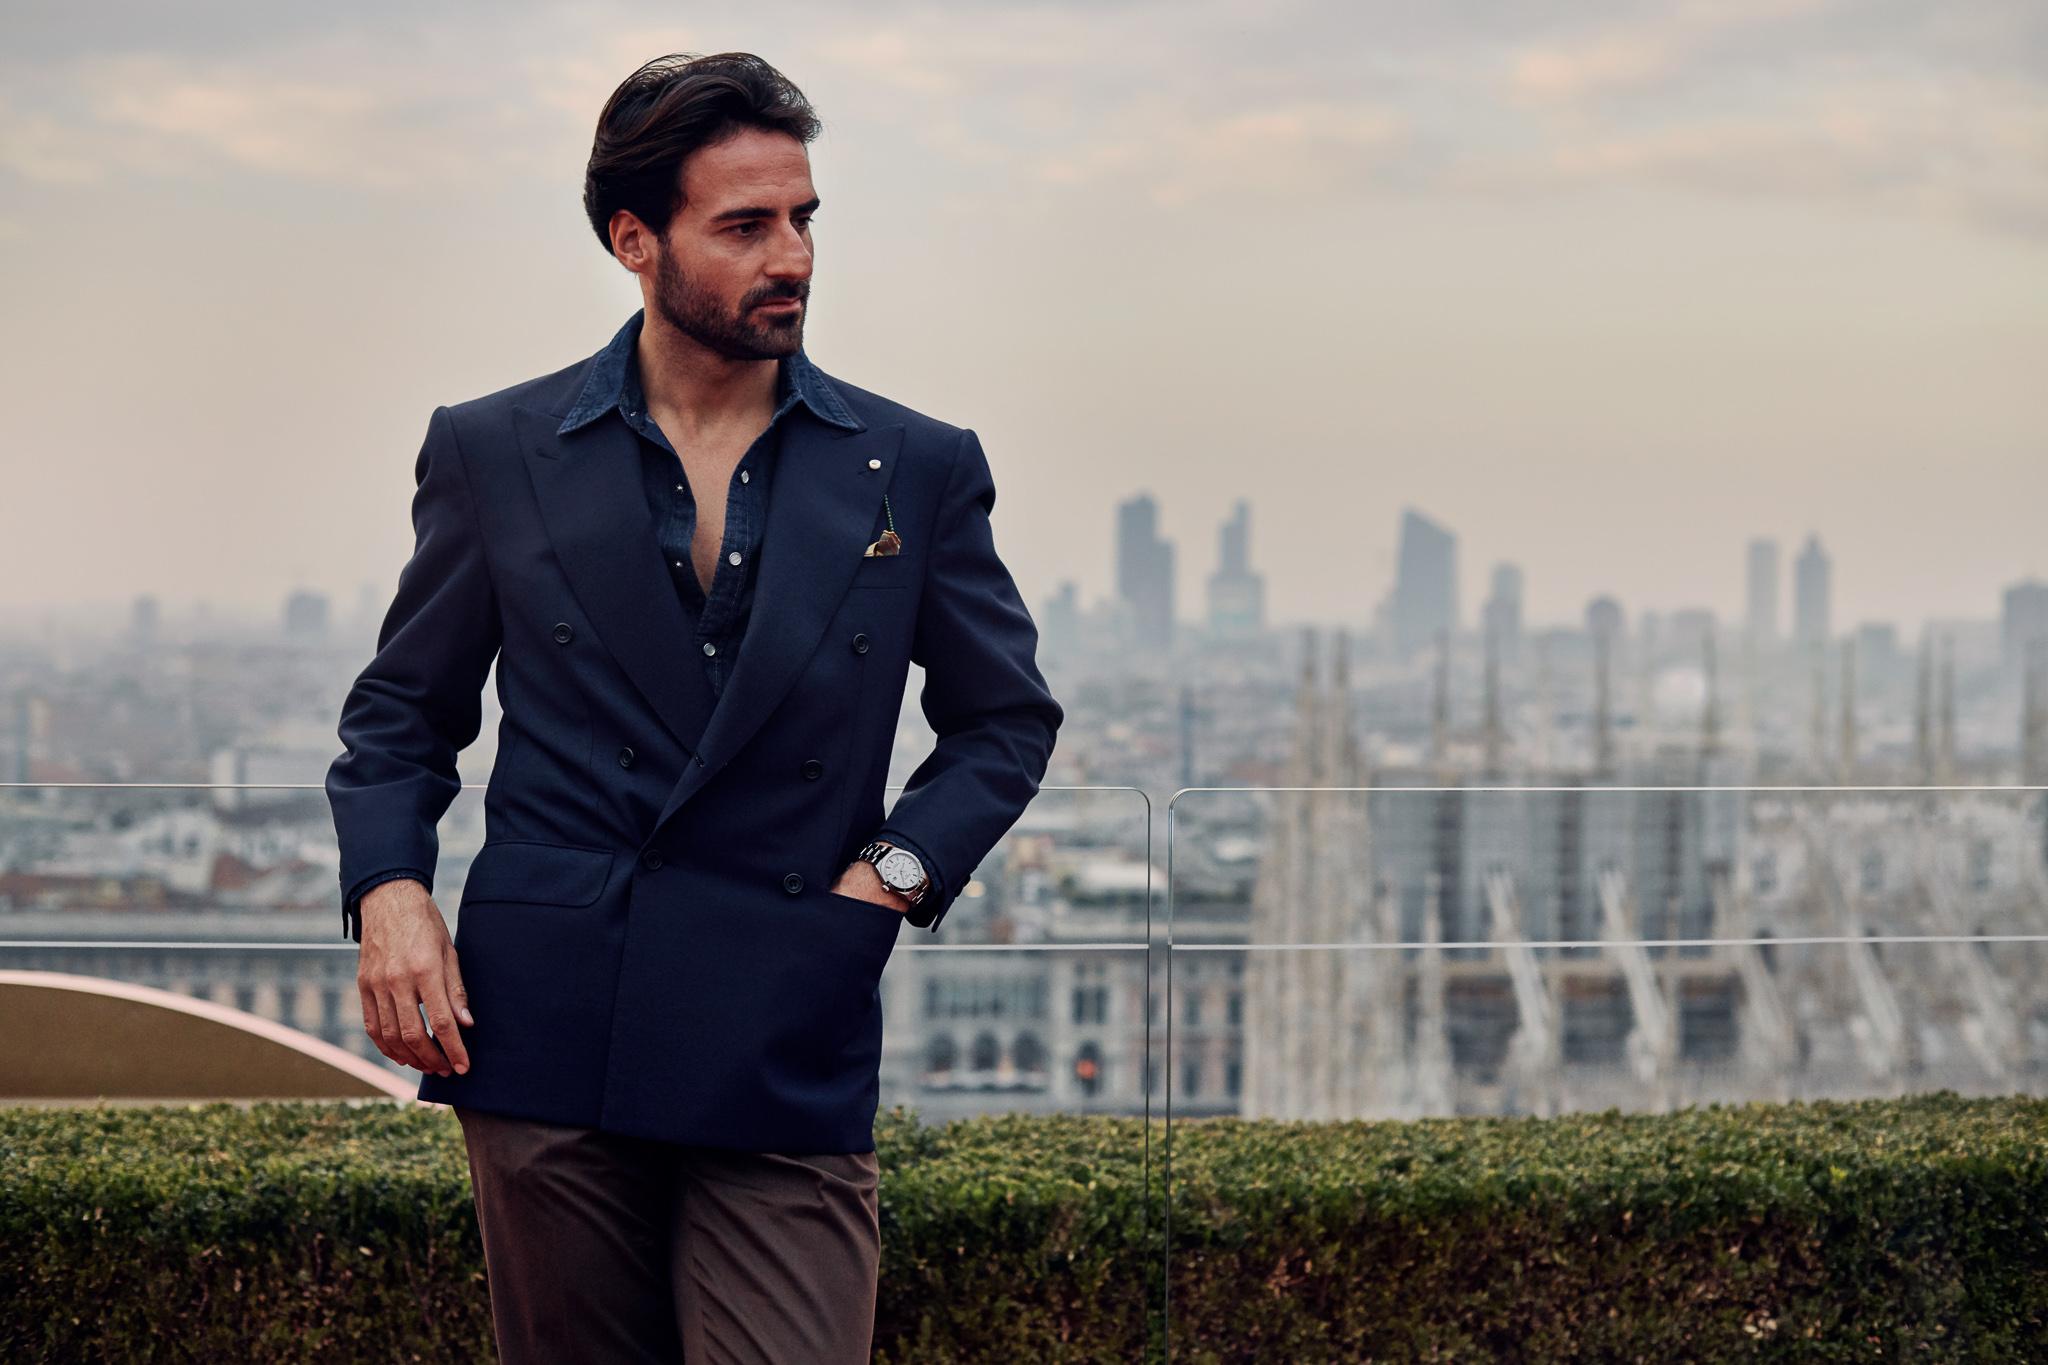 The Gentleman Watch according to Tissot